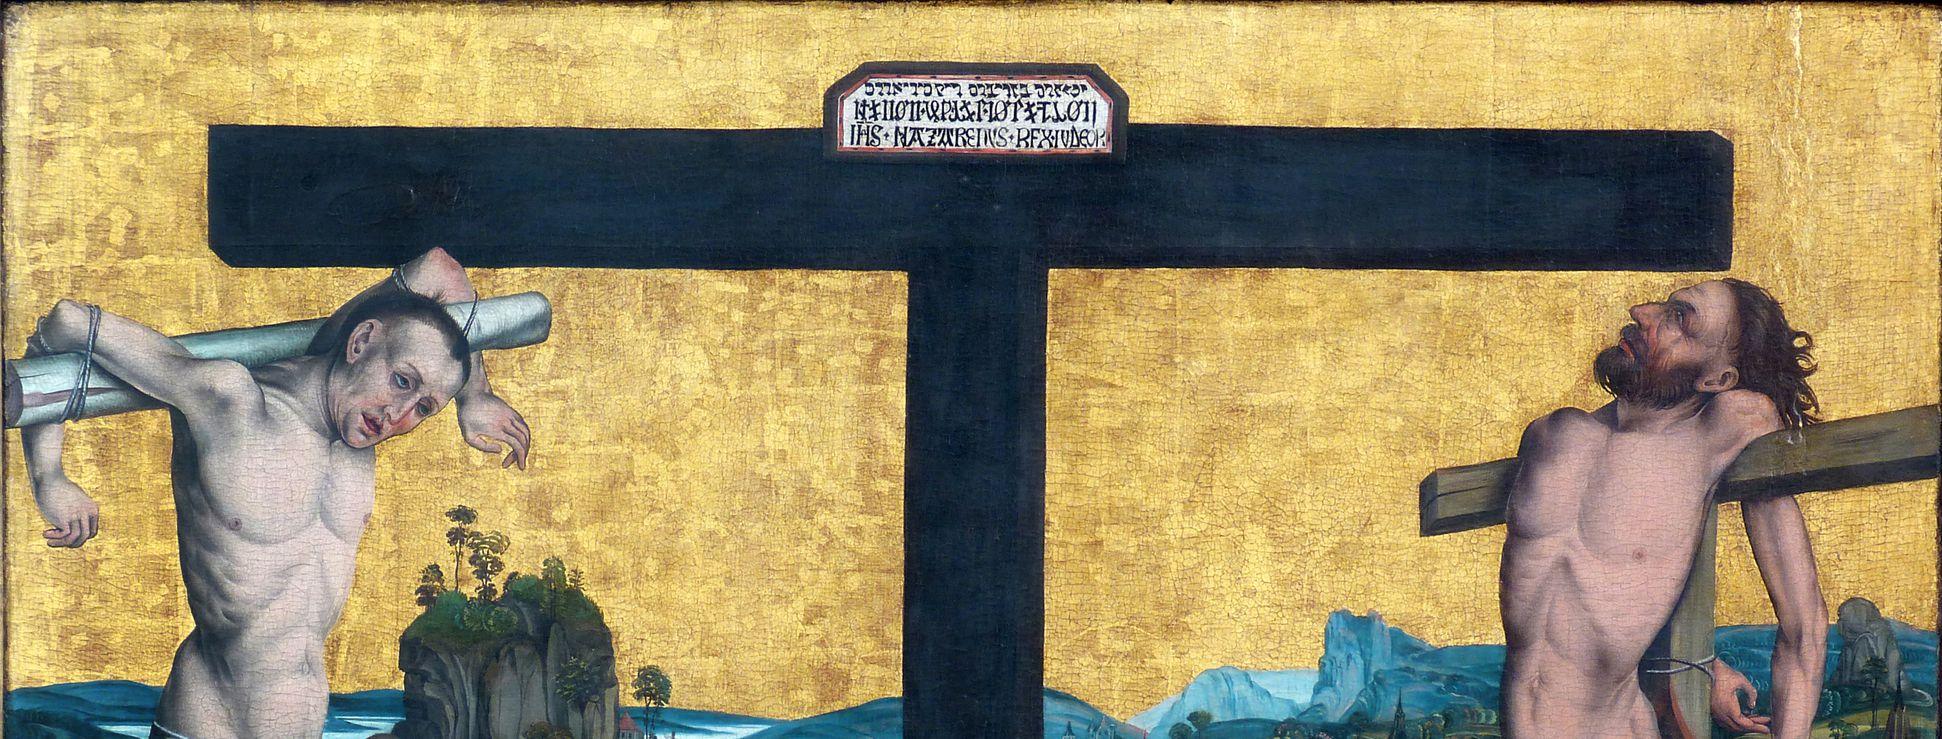 Epitaph for Georg Keyper Cross with inscription, on the left Dismas, on the right Gismas